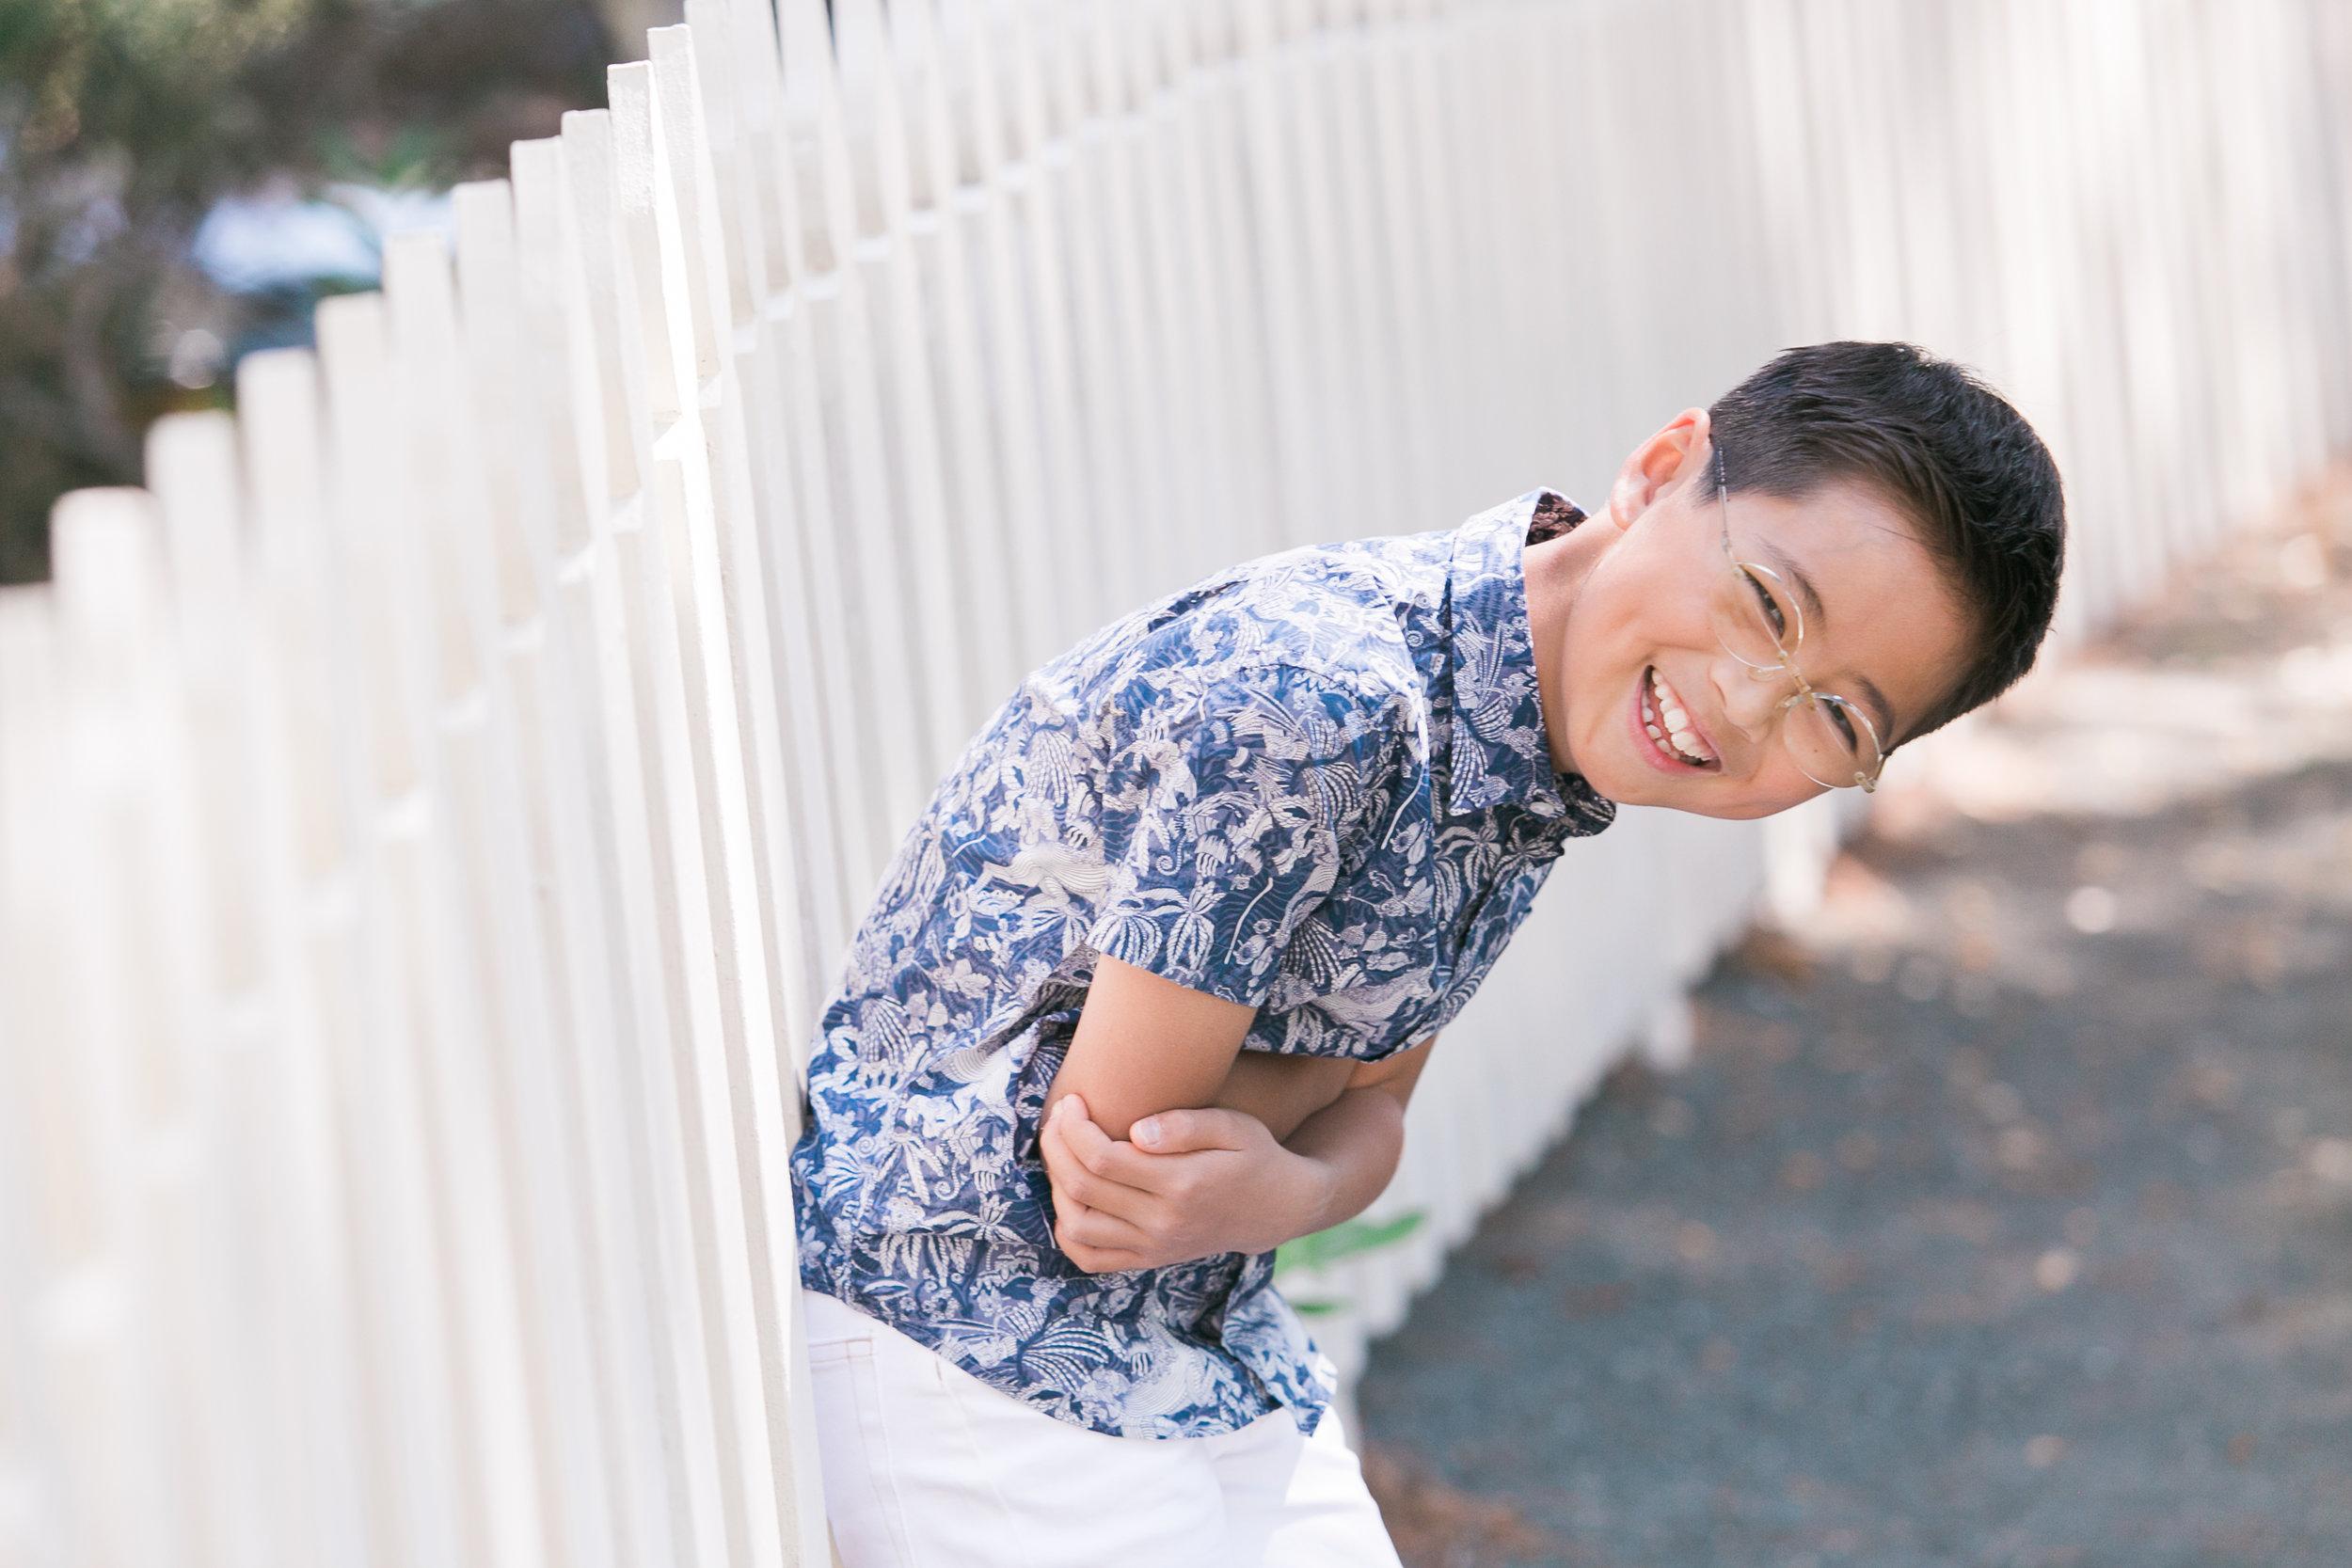 Mountain_View_Children_Family_Portrait_007.jpg